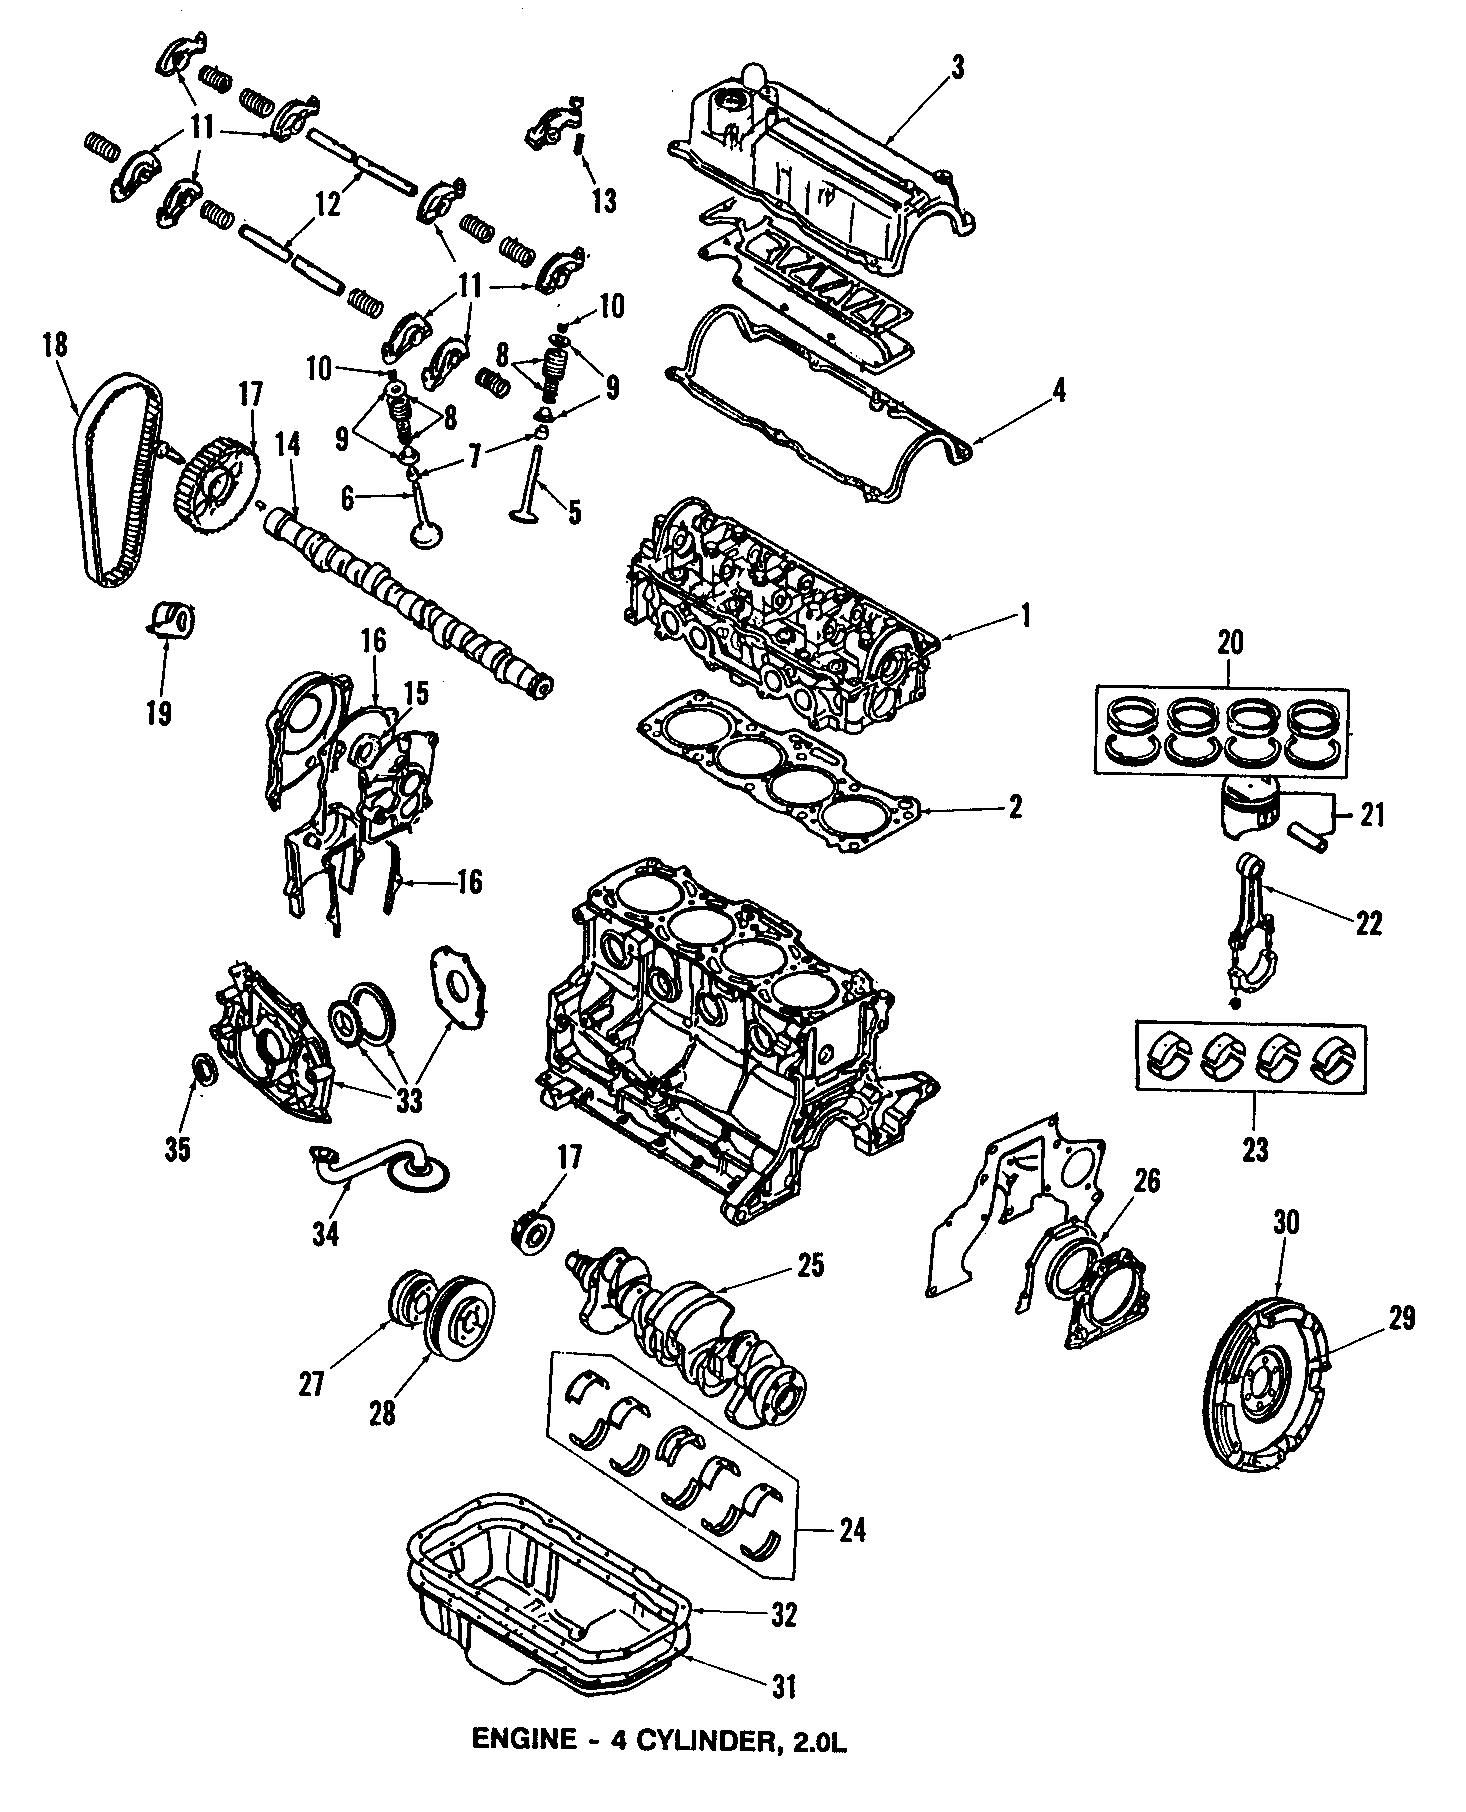 1987 Mazda Engine Timing Crankshaft Sprocket. Crankshaft